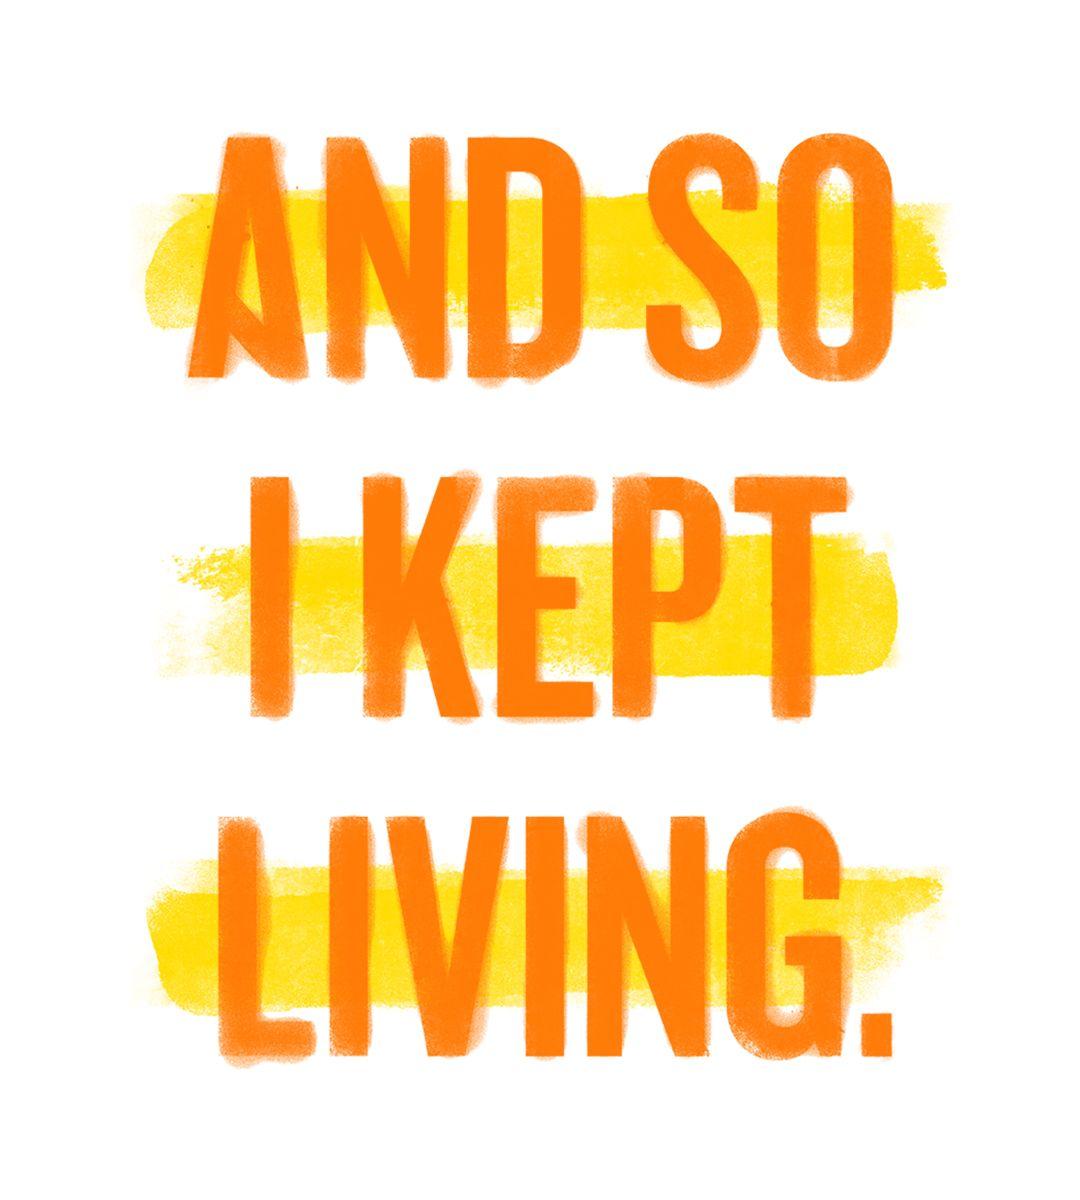 September 10 2016 World Suicide Prevention Day And So I Kept Living